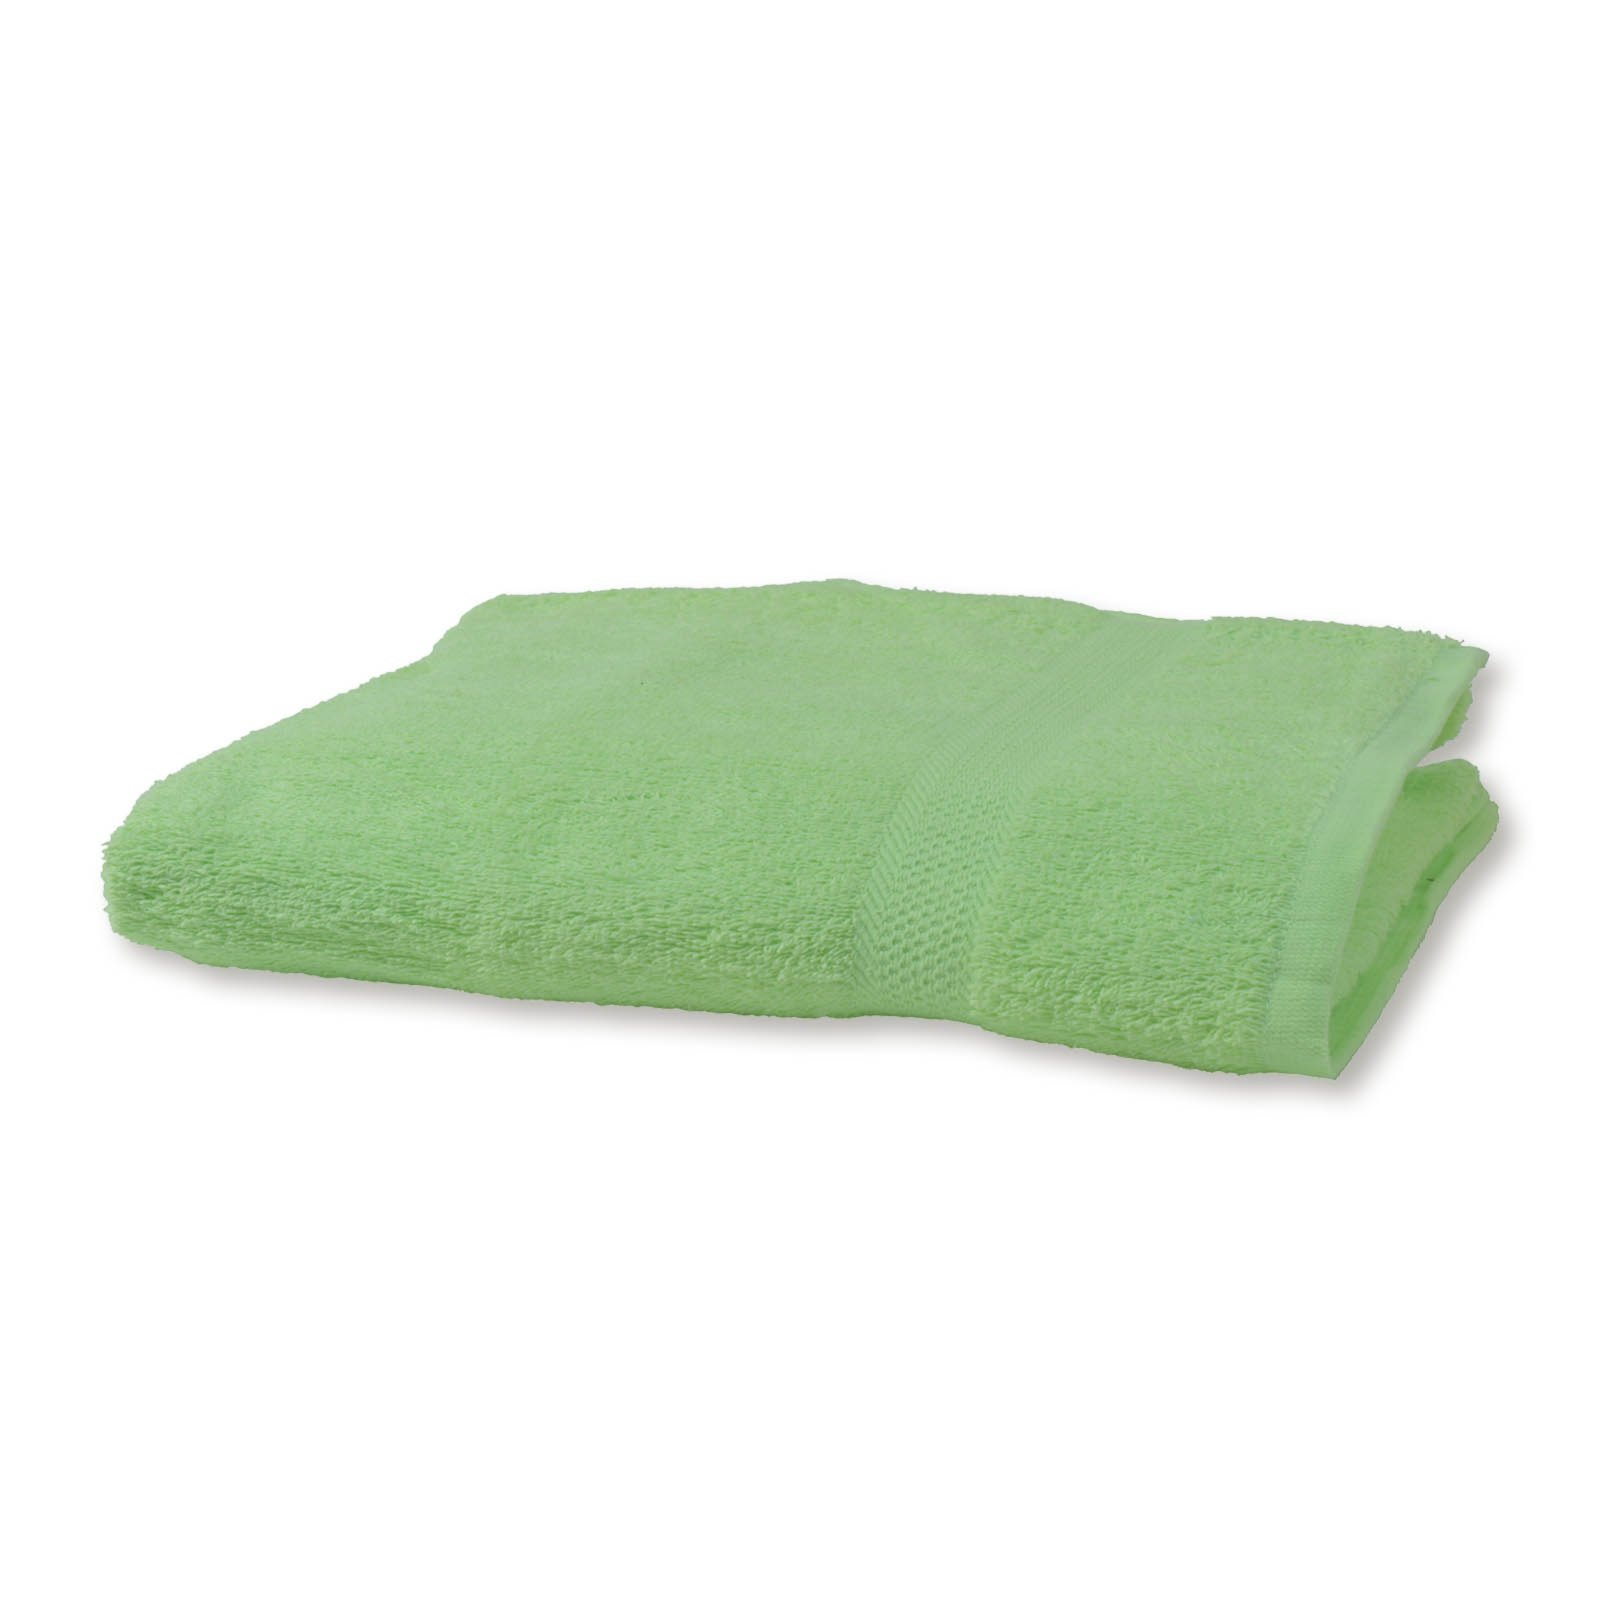 Handtuch CLASSIC - Baumwolle - gru00fcn - 50x90 cm ...